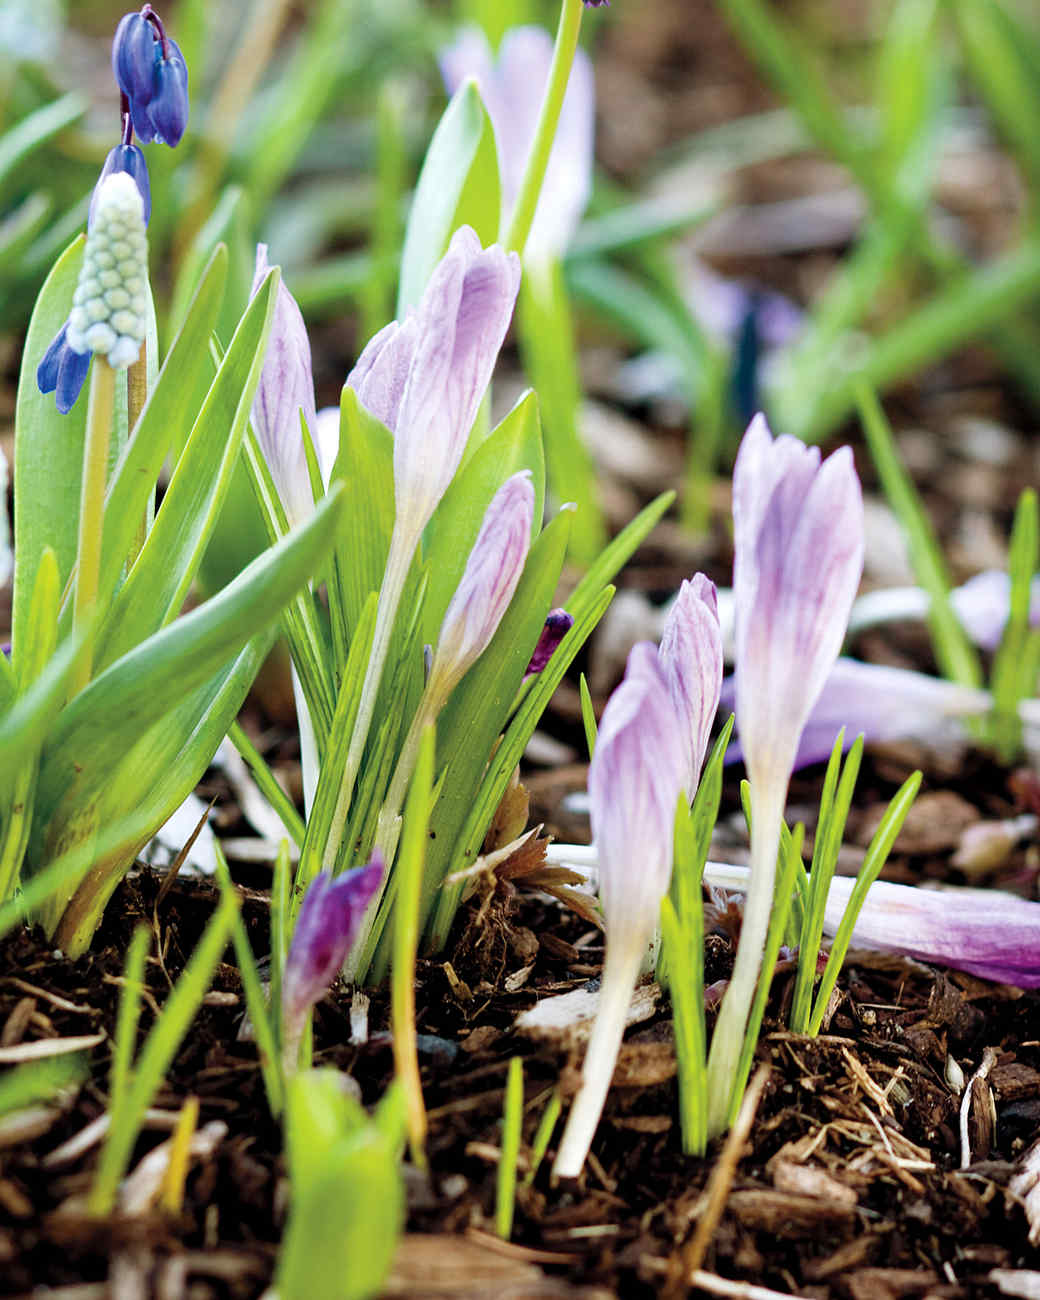 blue-flowers-bulbs-0911-mld107428.jpg